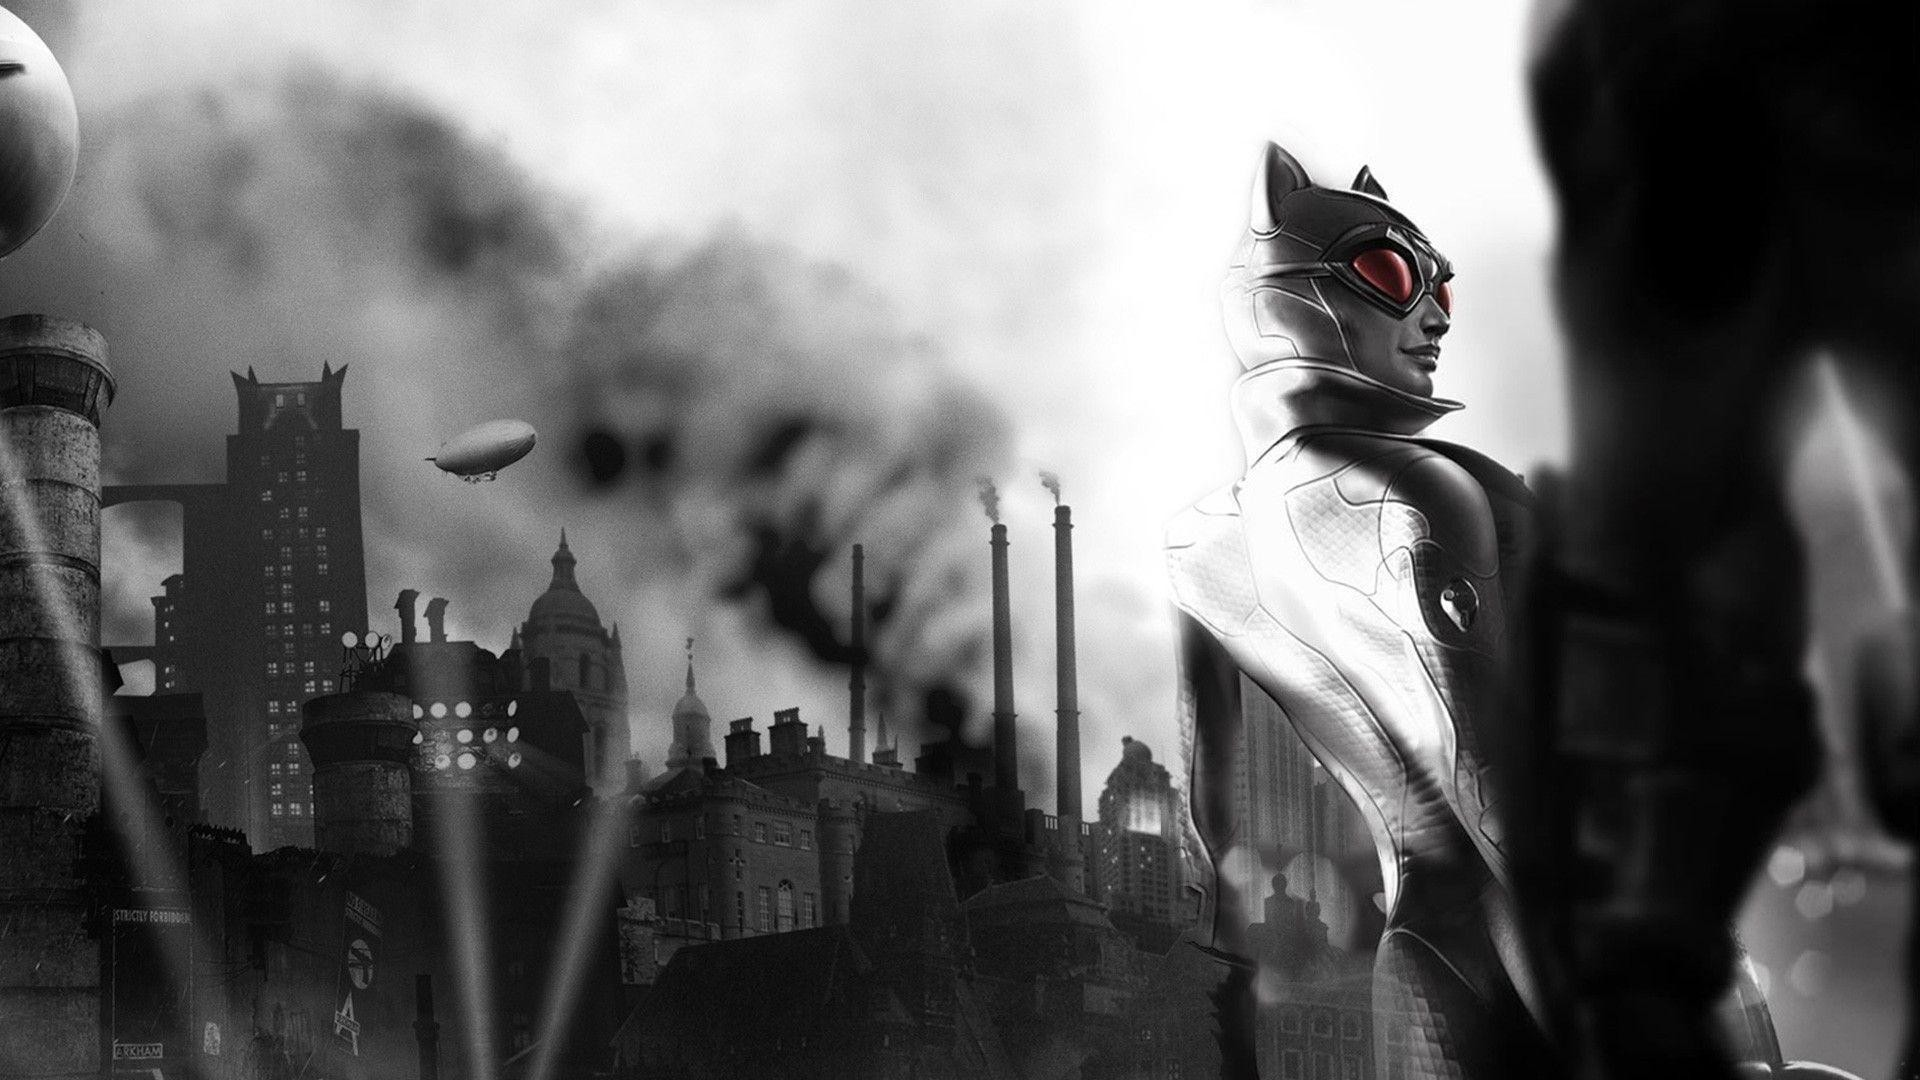 Wallpapers For > Batman Arkham City Wallpaper Hd